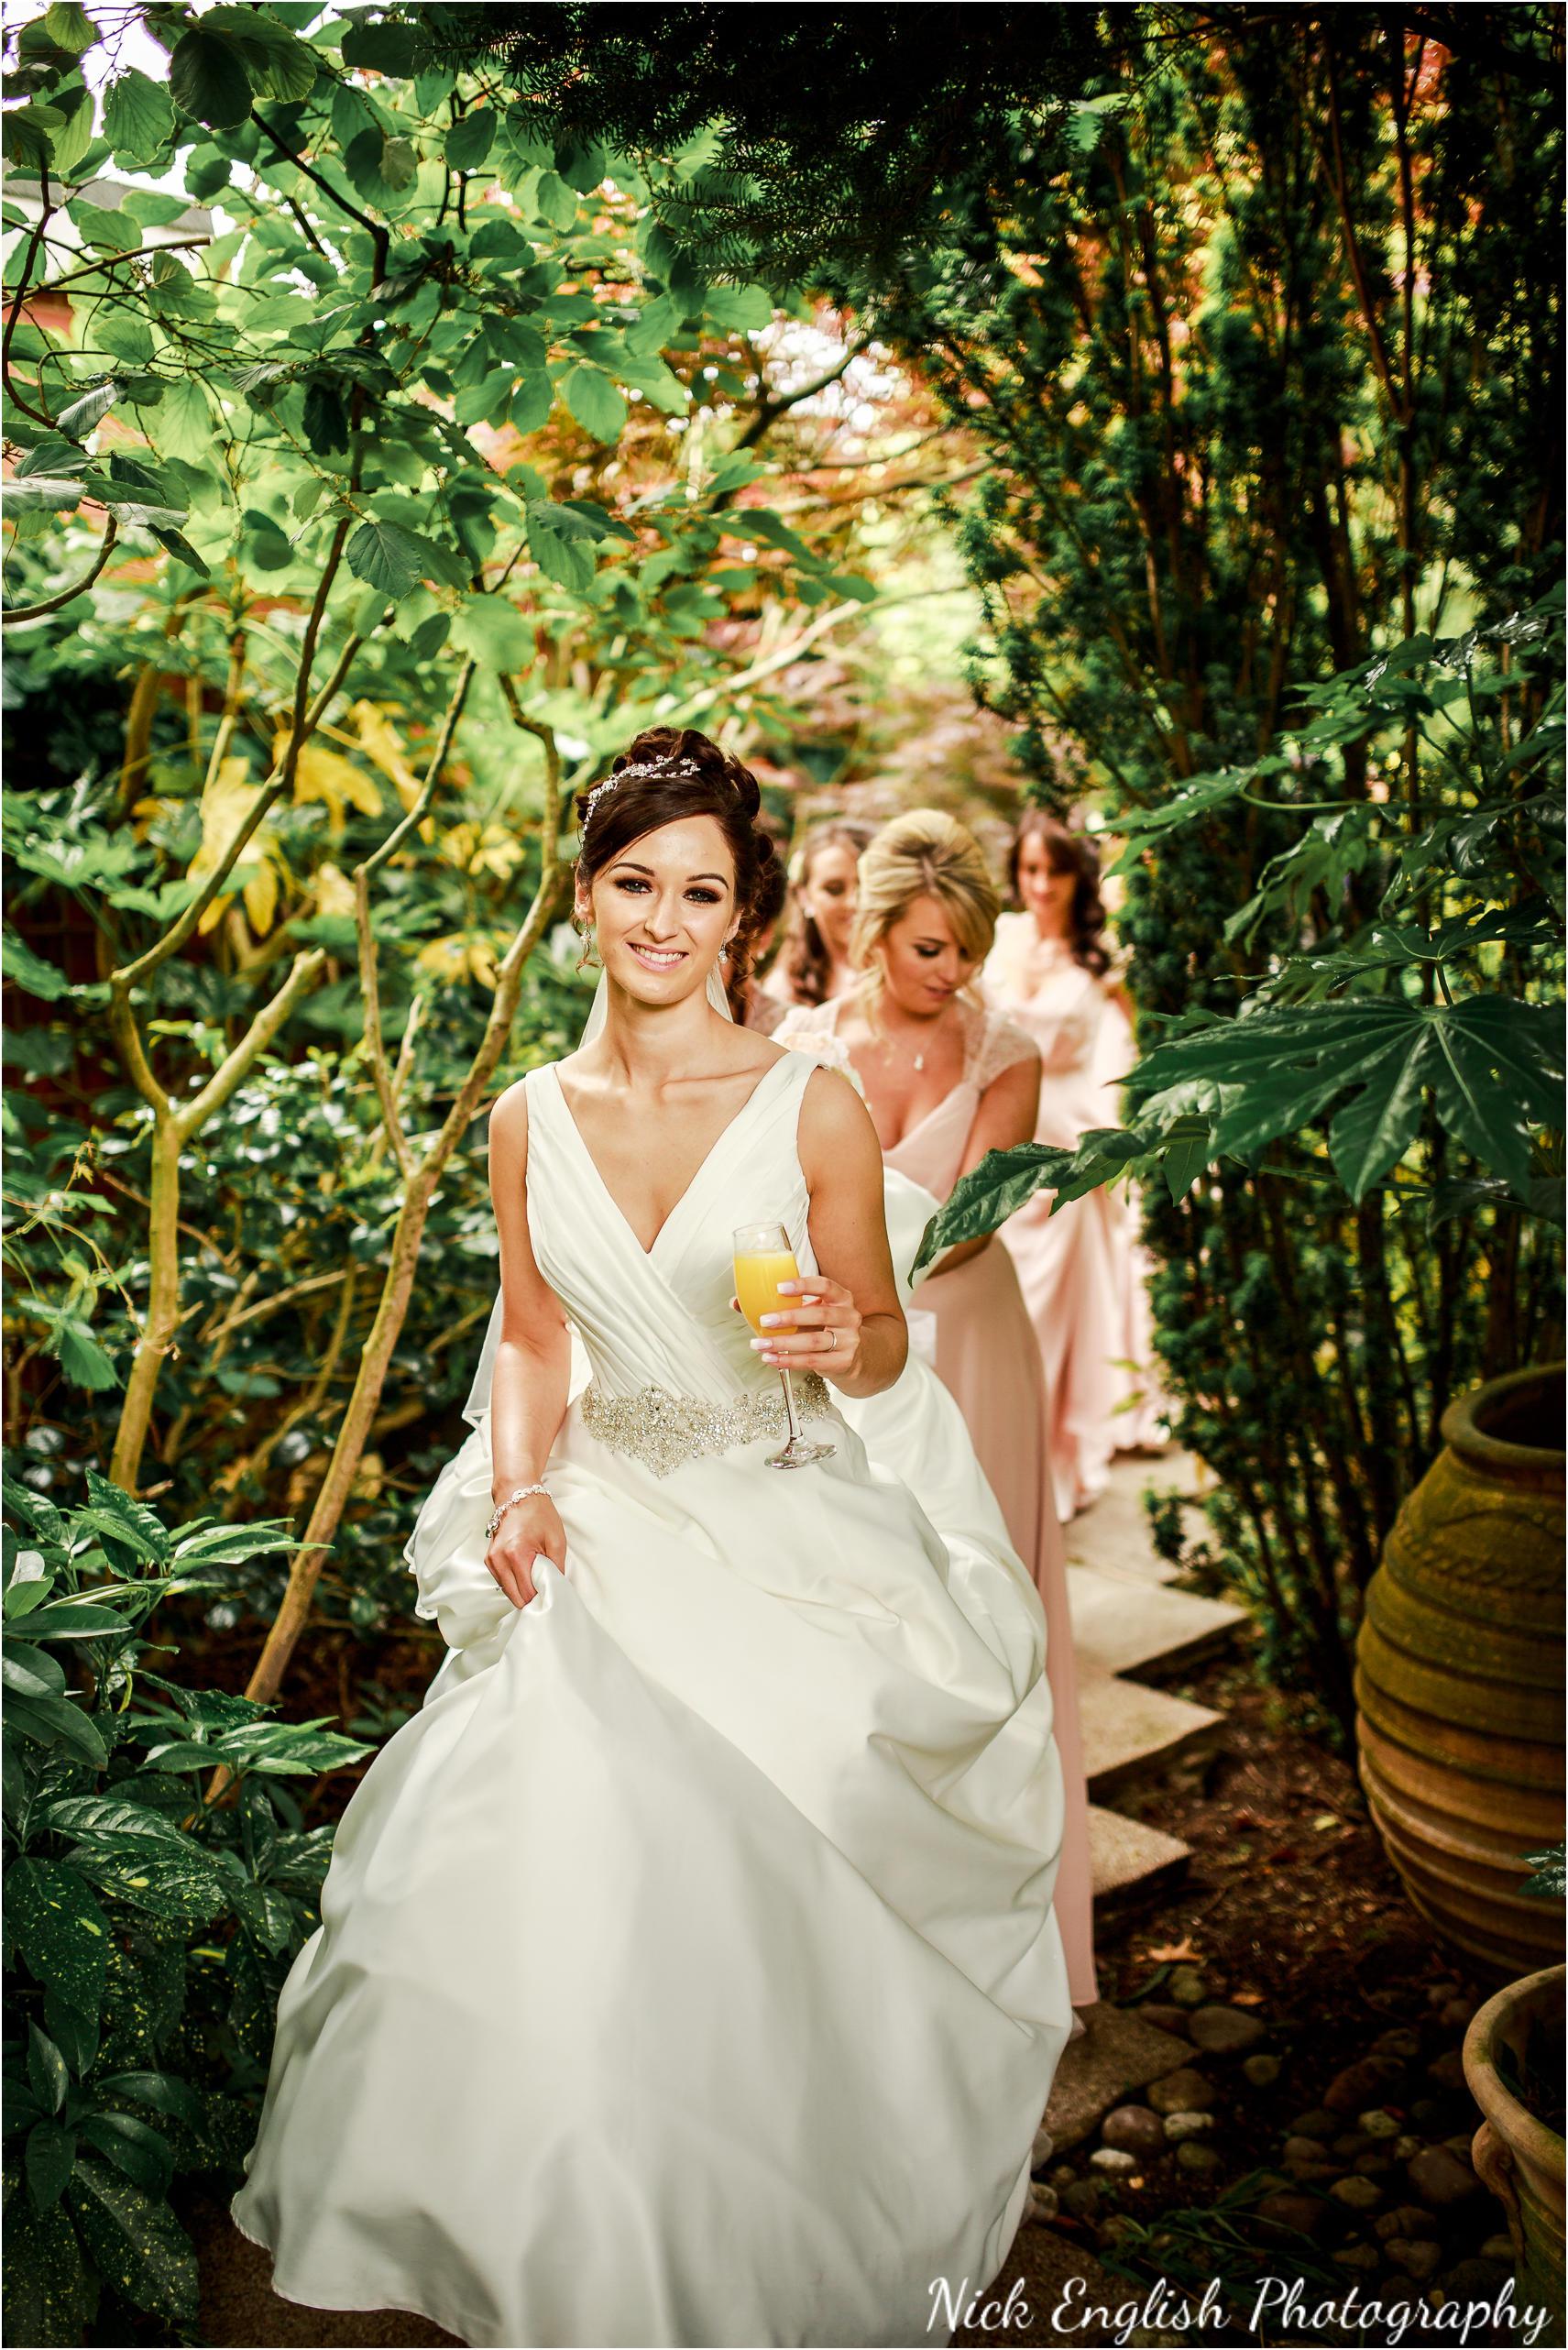 Emily David Wedding Photographs at Barton Grange Preston by Nick English Photography 89jpg.jpeg